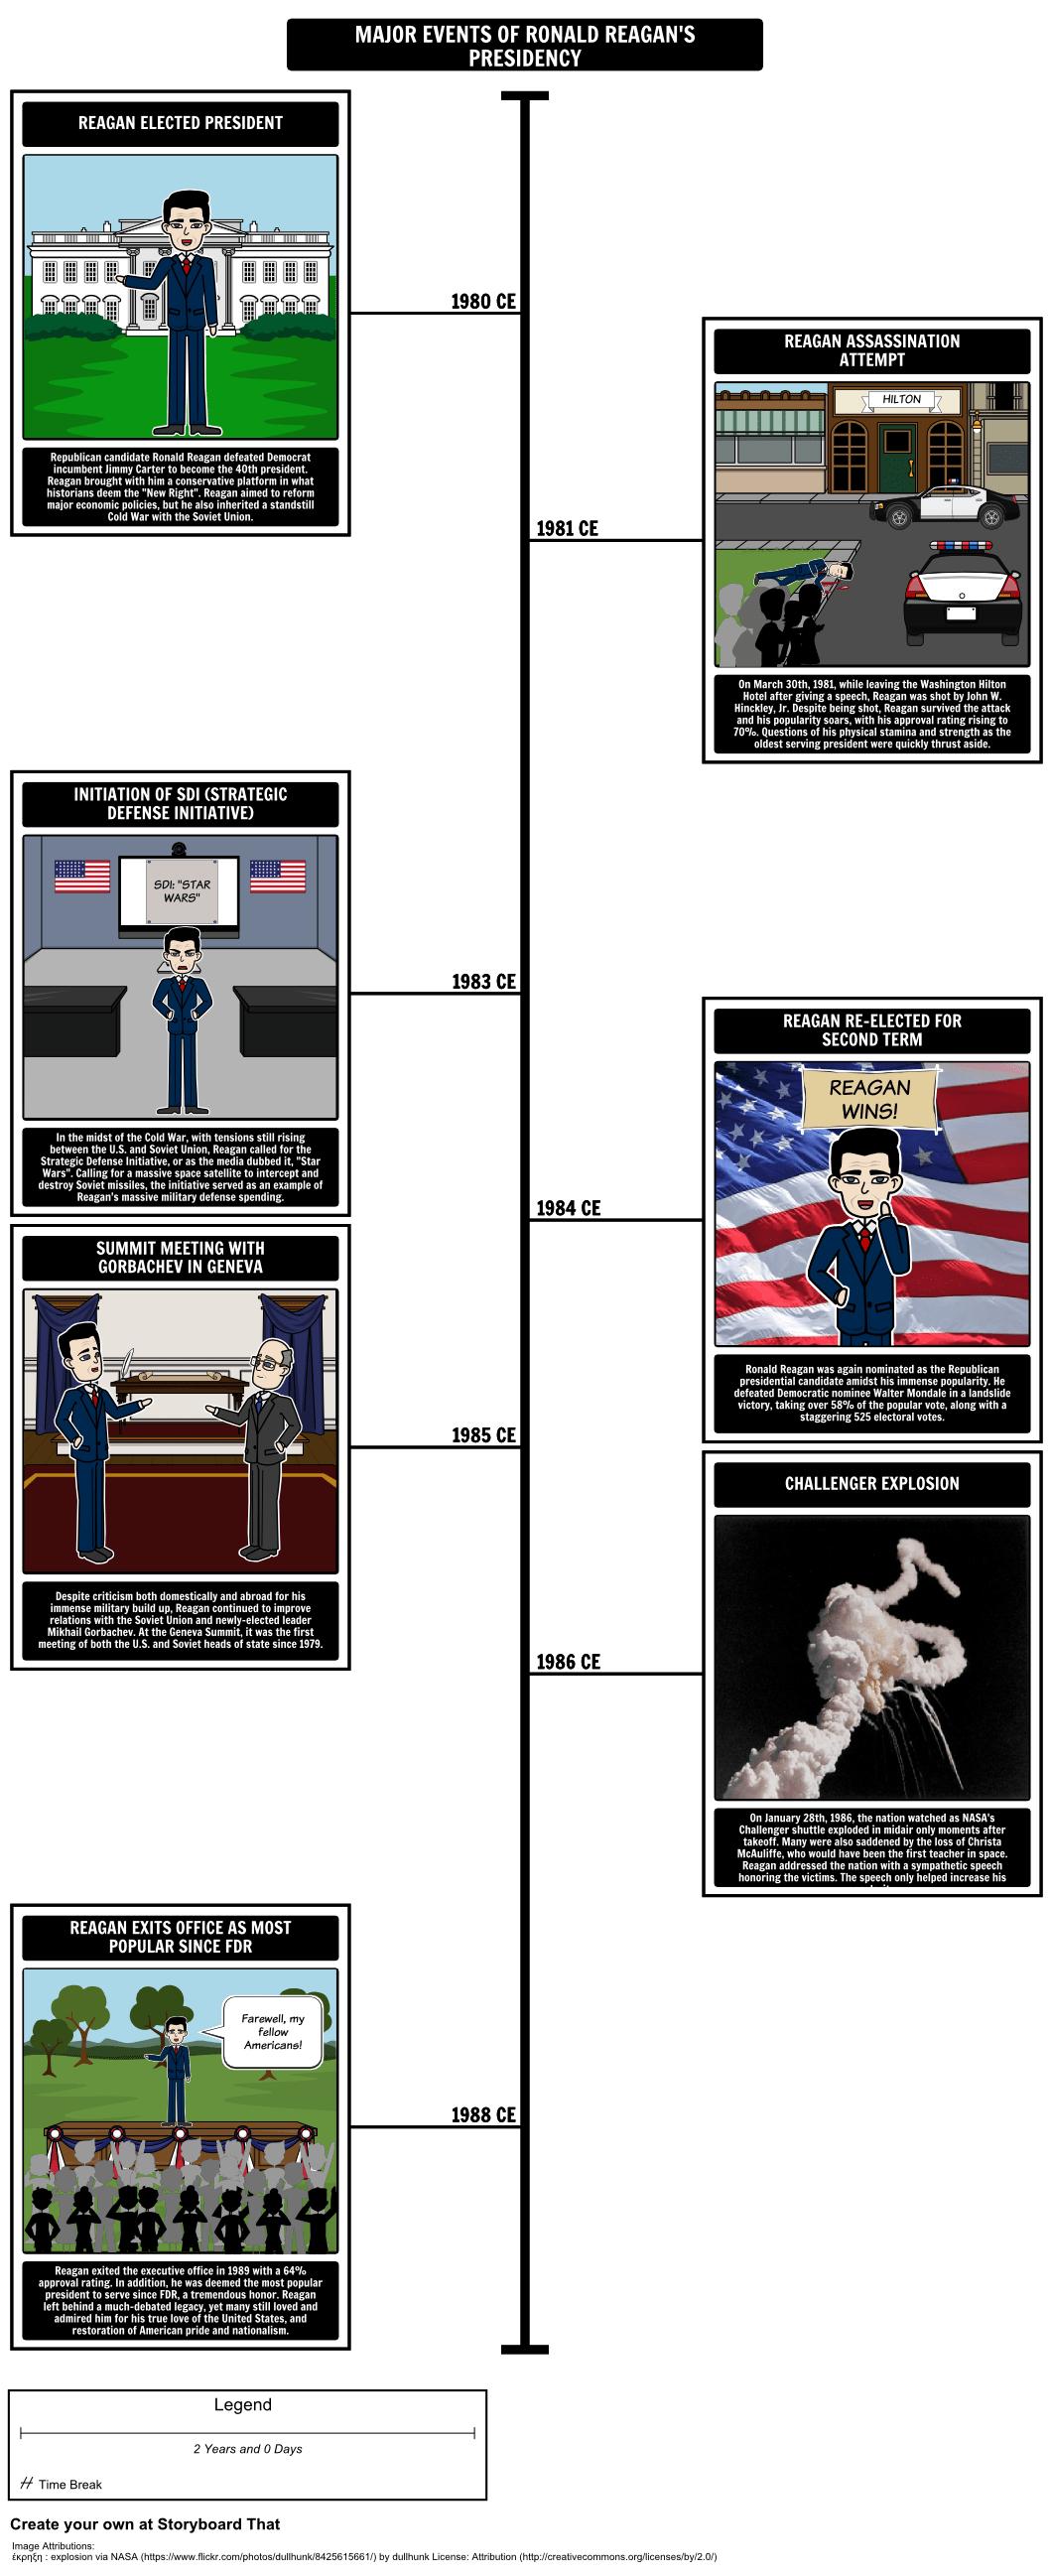 Reagan Presidency